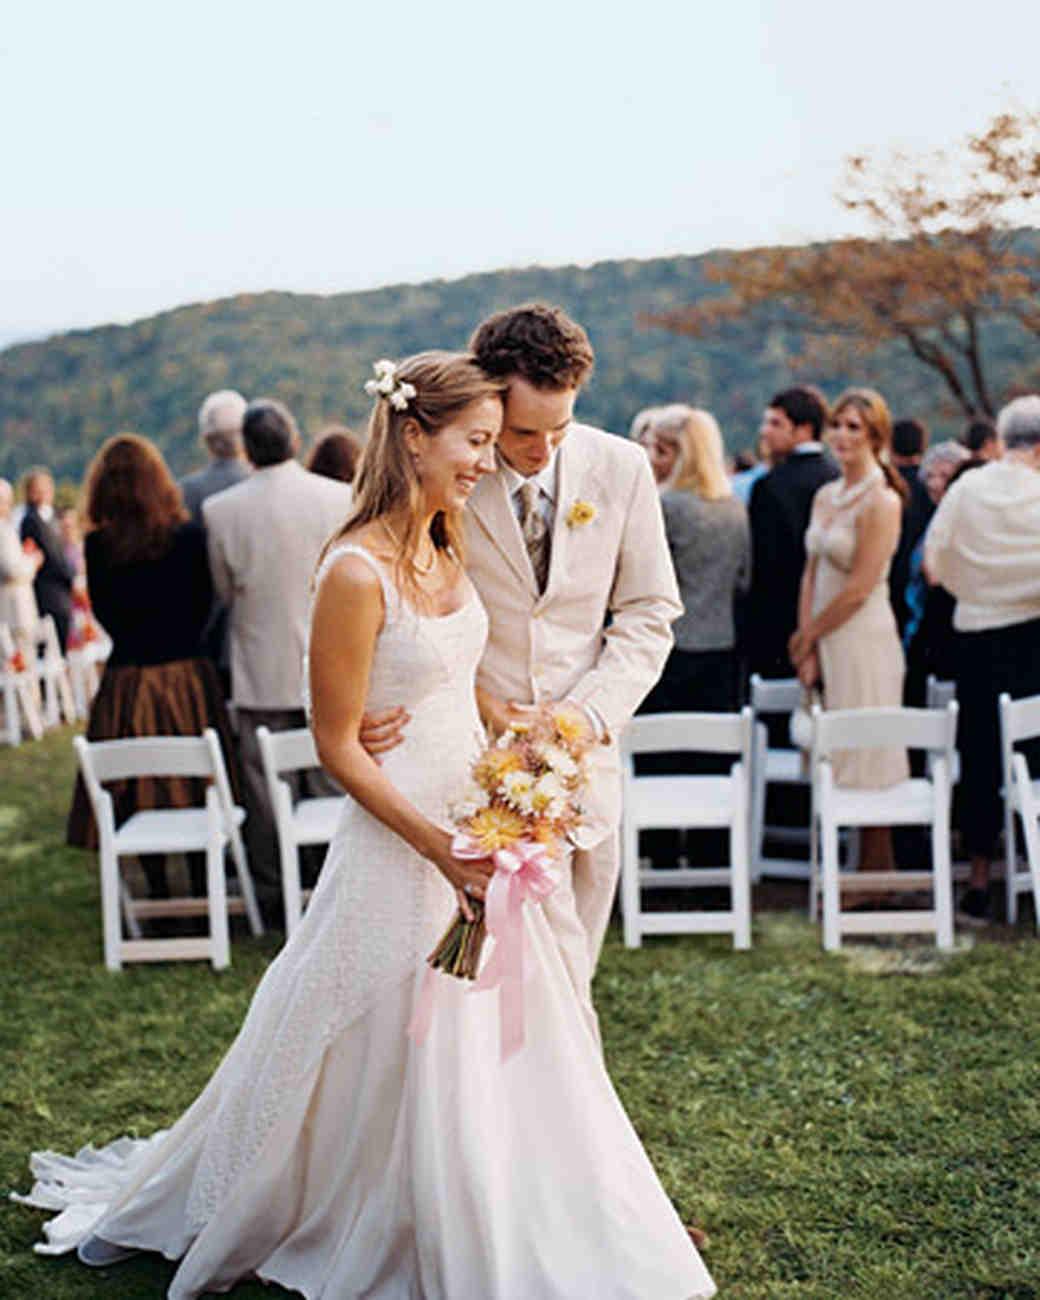 A Vibrant Casual Outdoor Wedding in Tennessee  Martha Stewart Weddings